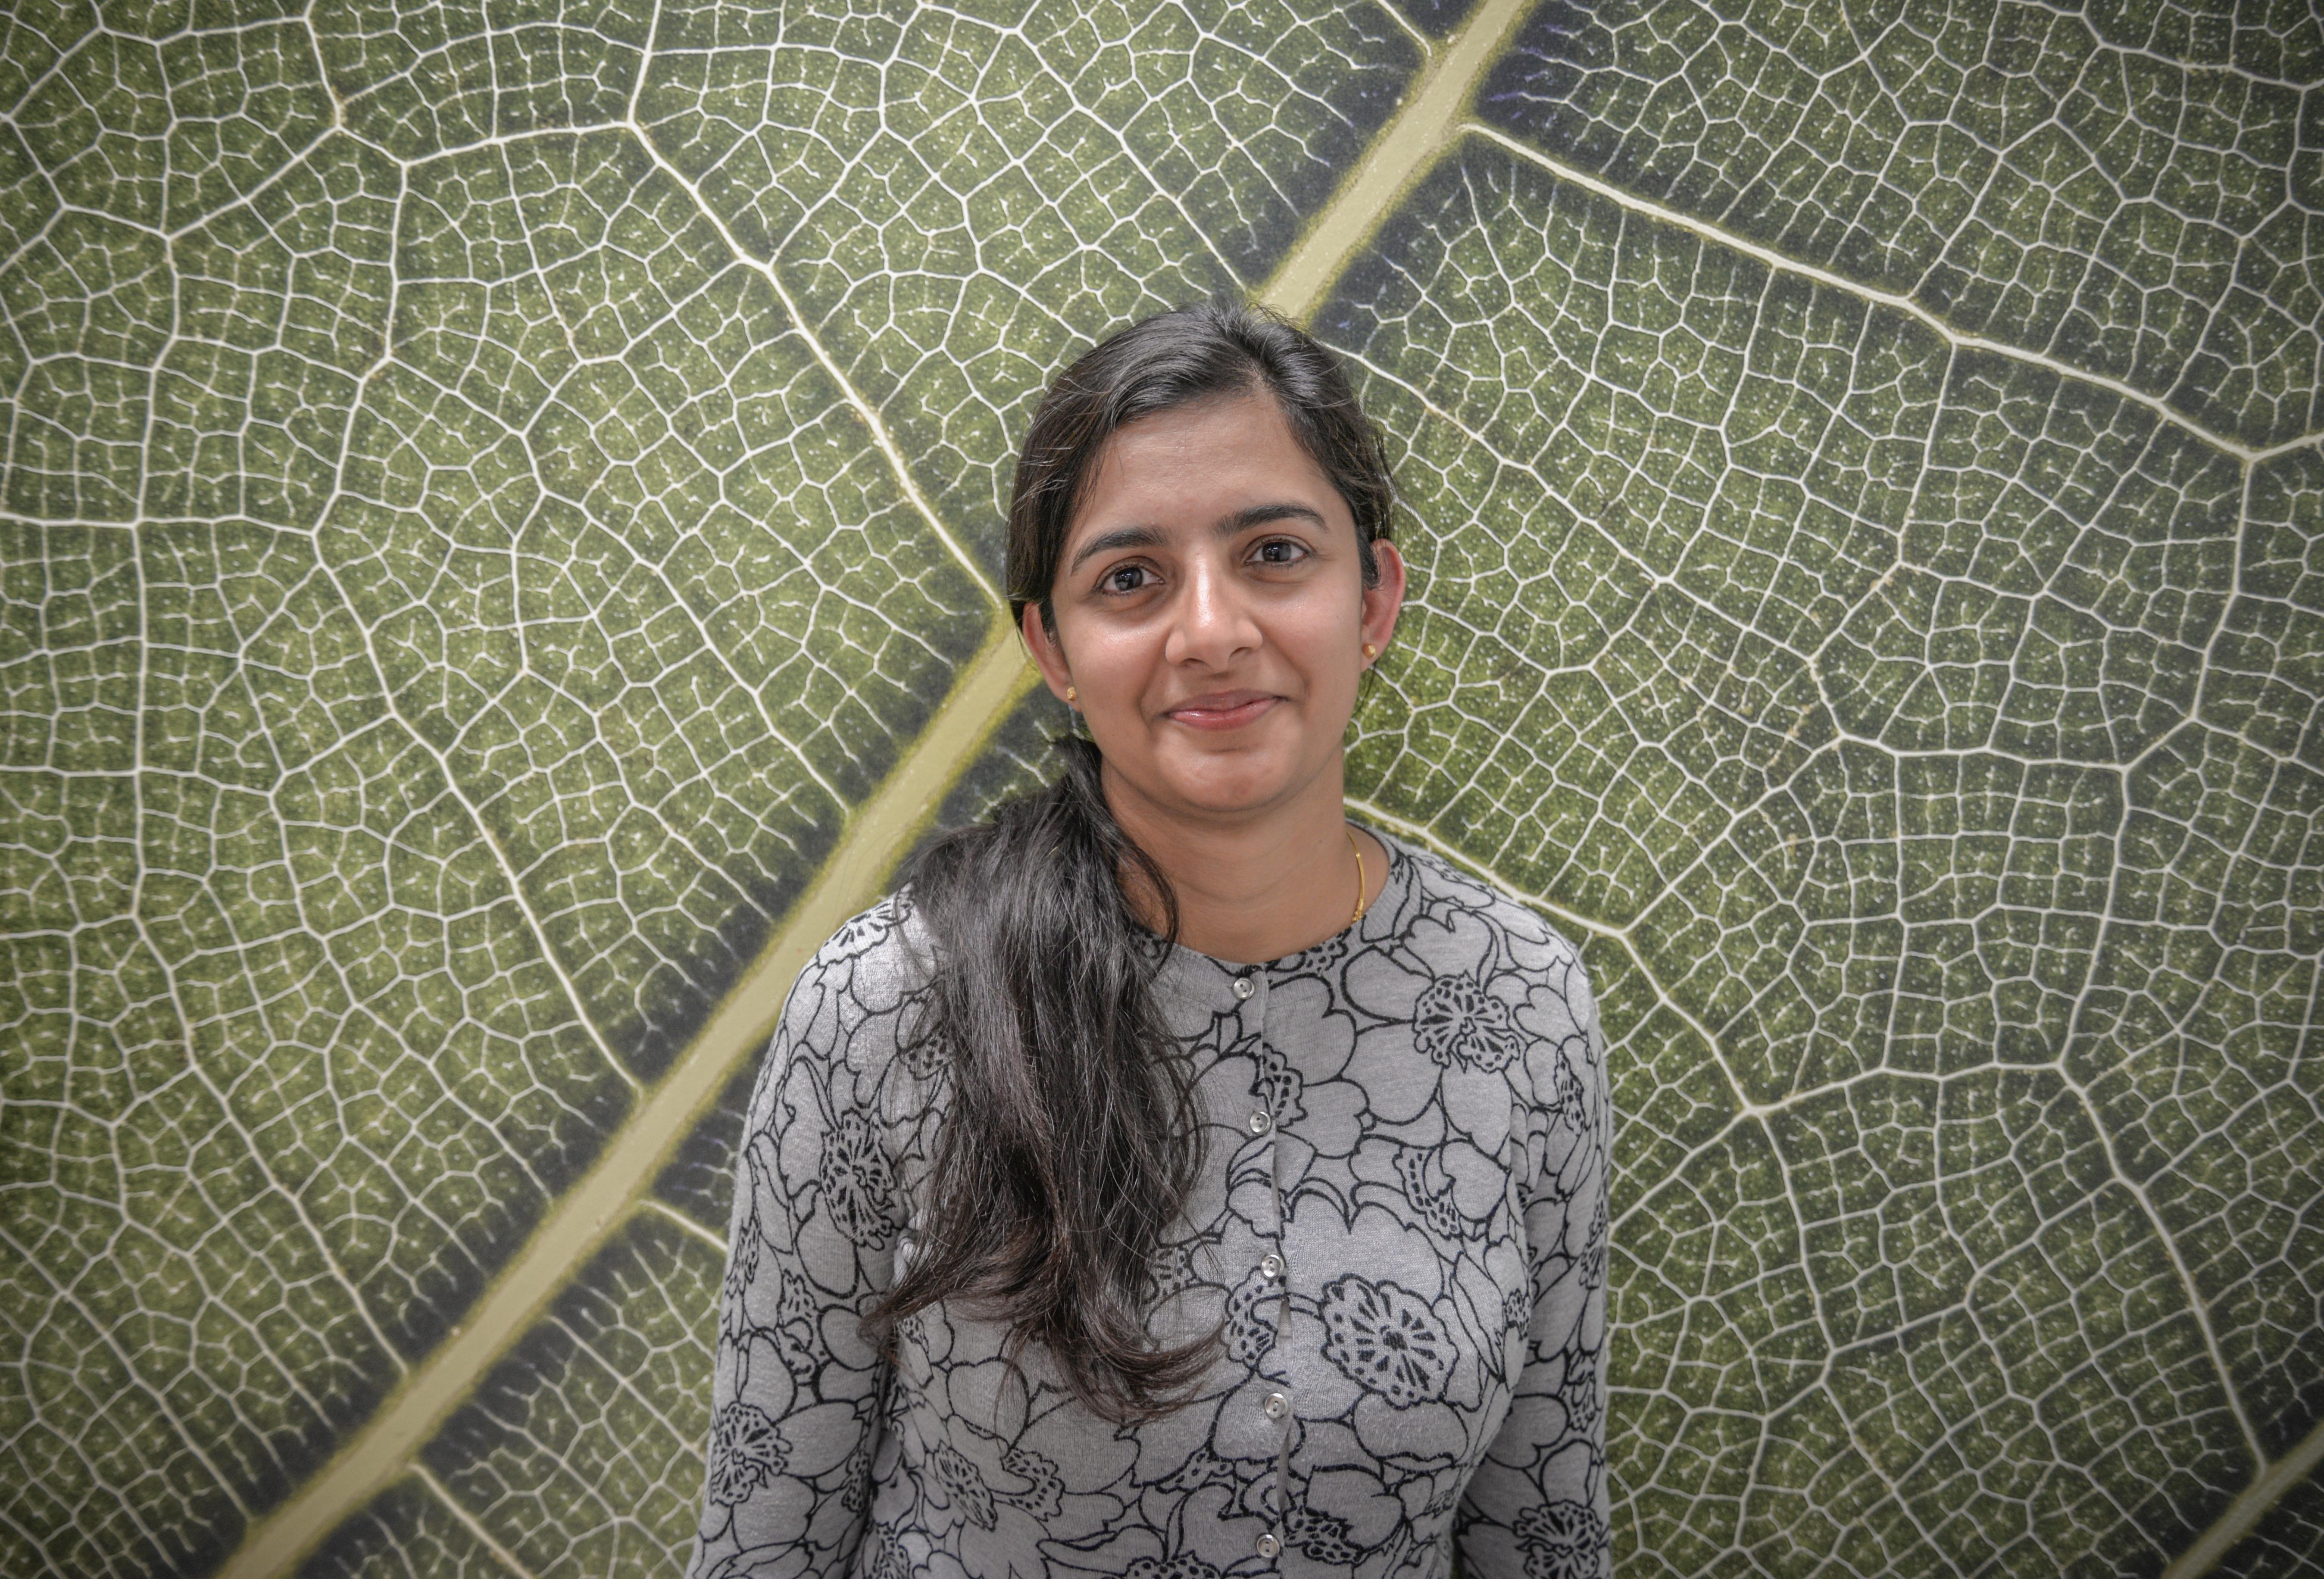 Agworld staff member Kusum Khatkar